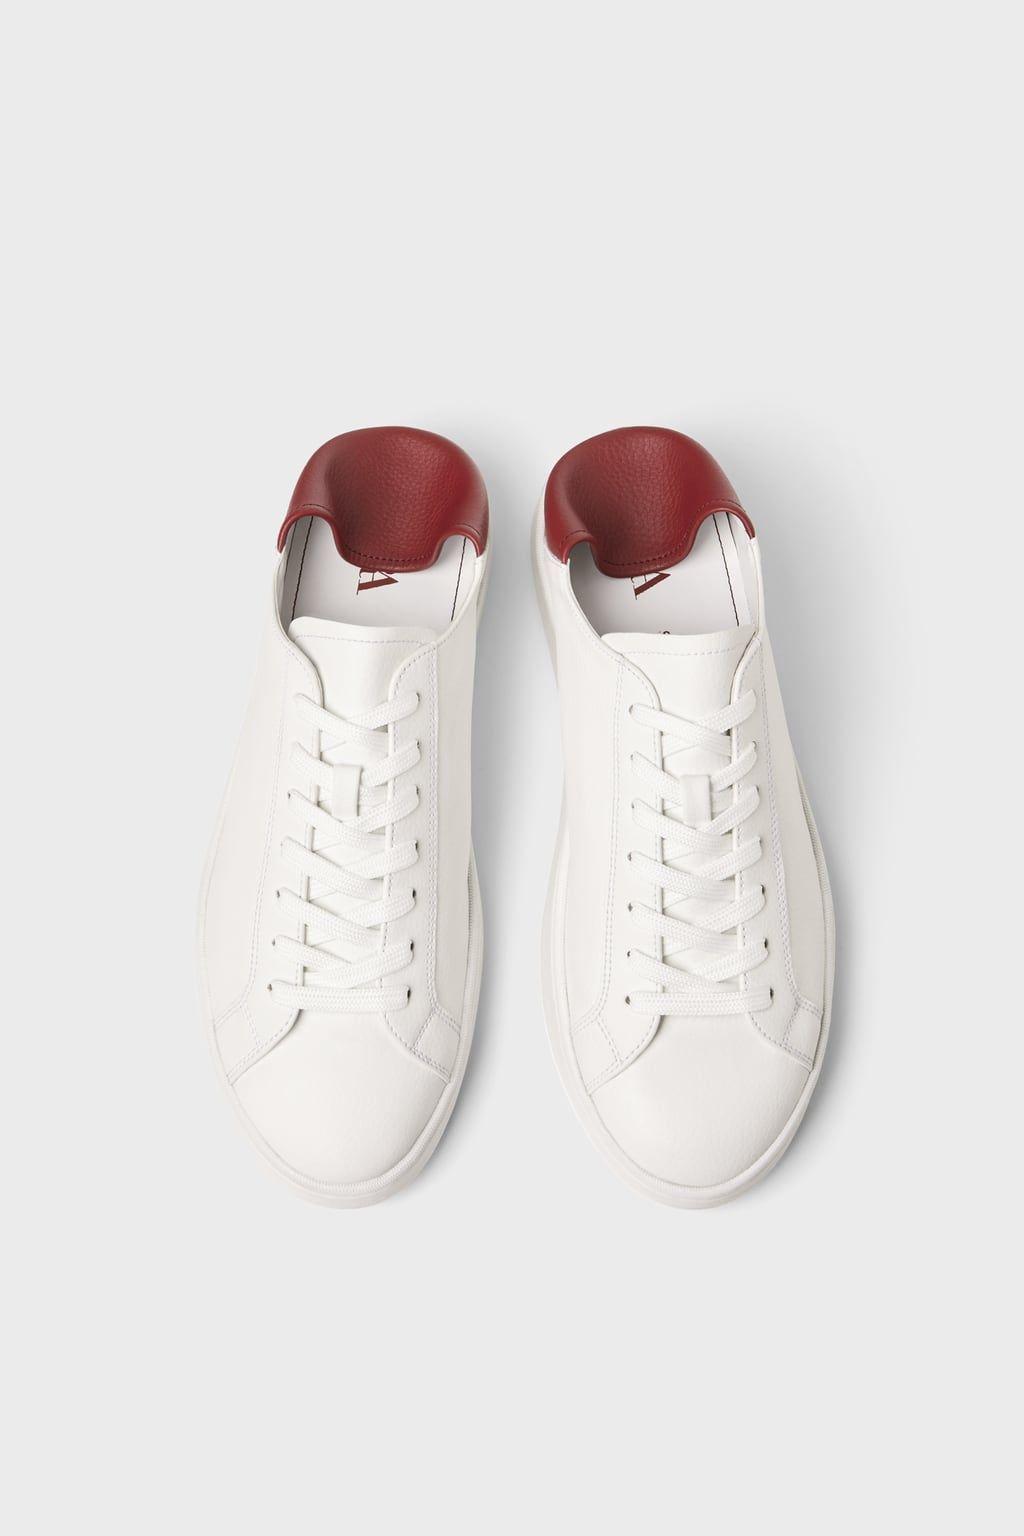 Sepatu Sneakers Putih Slingback Dua Warna Sepatu Sepatu Kets Zara